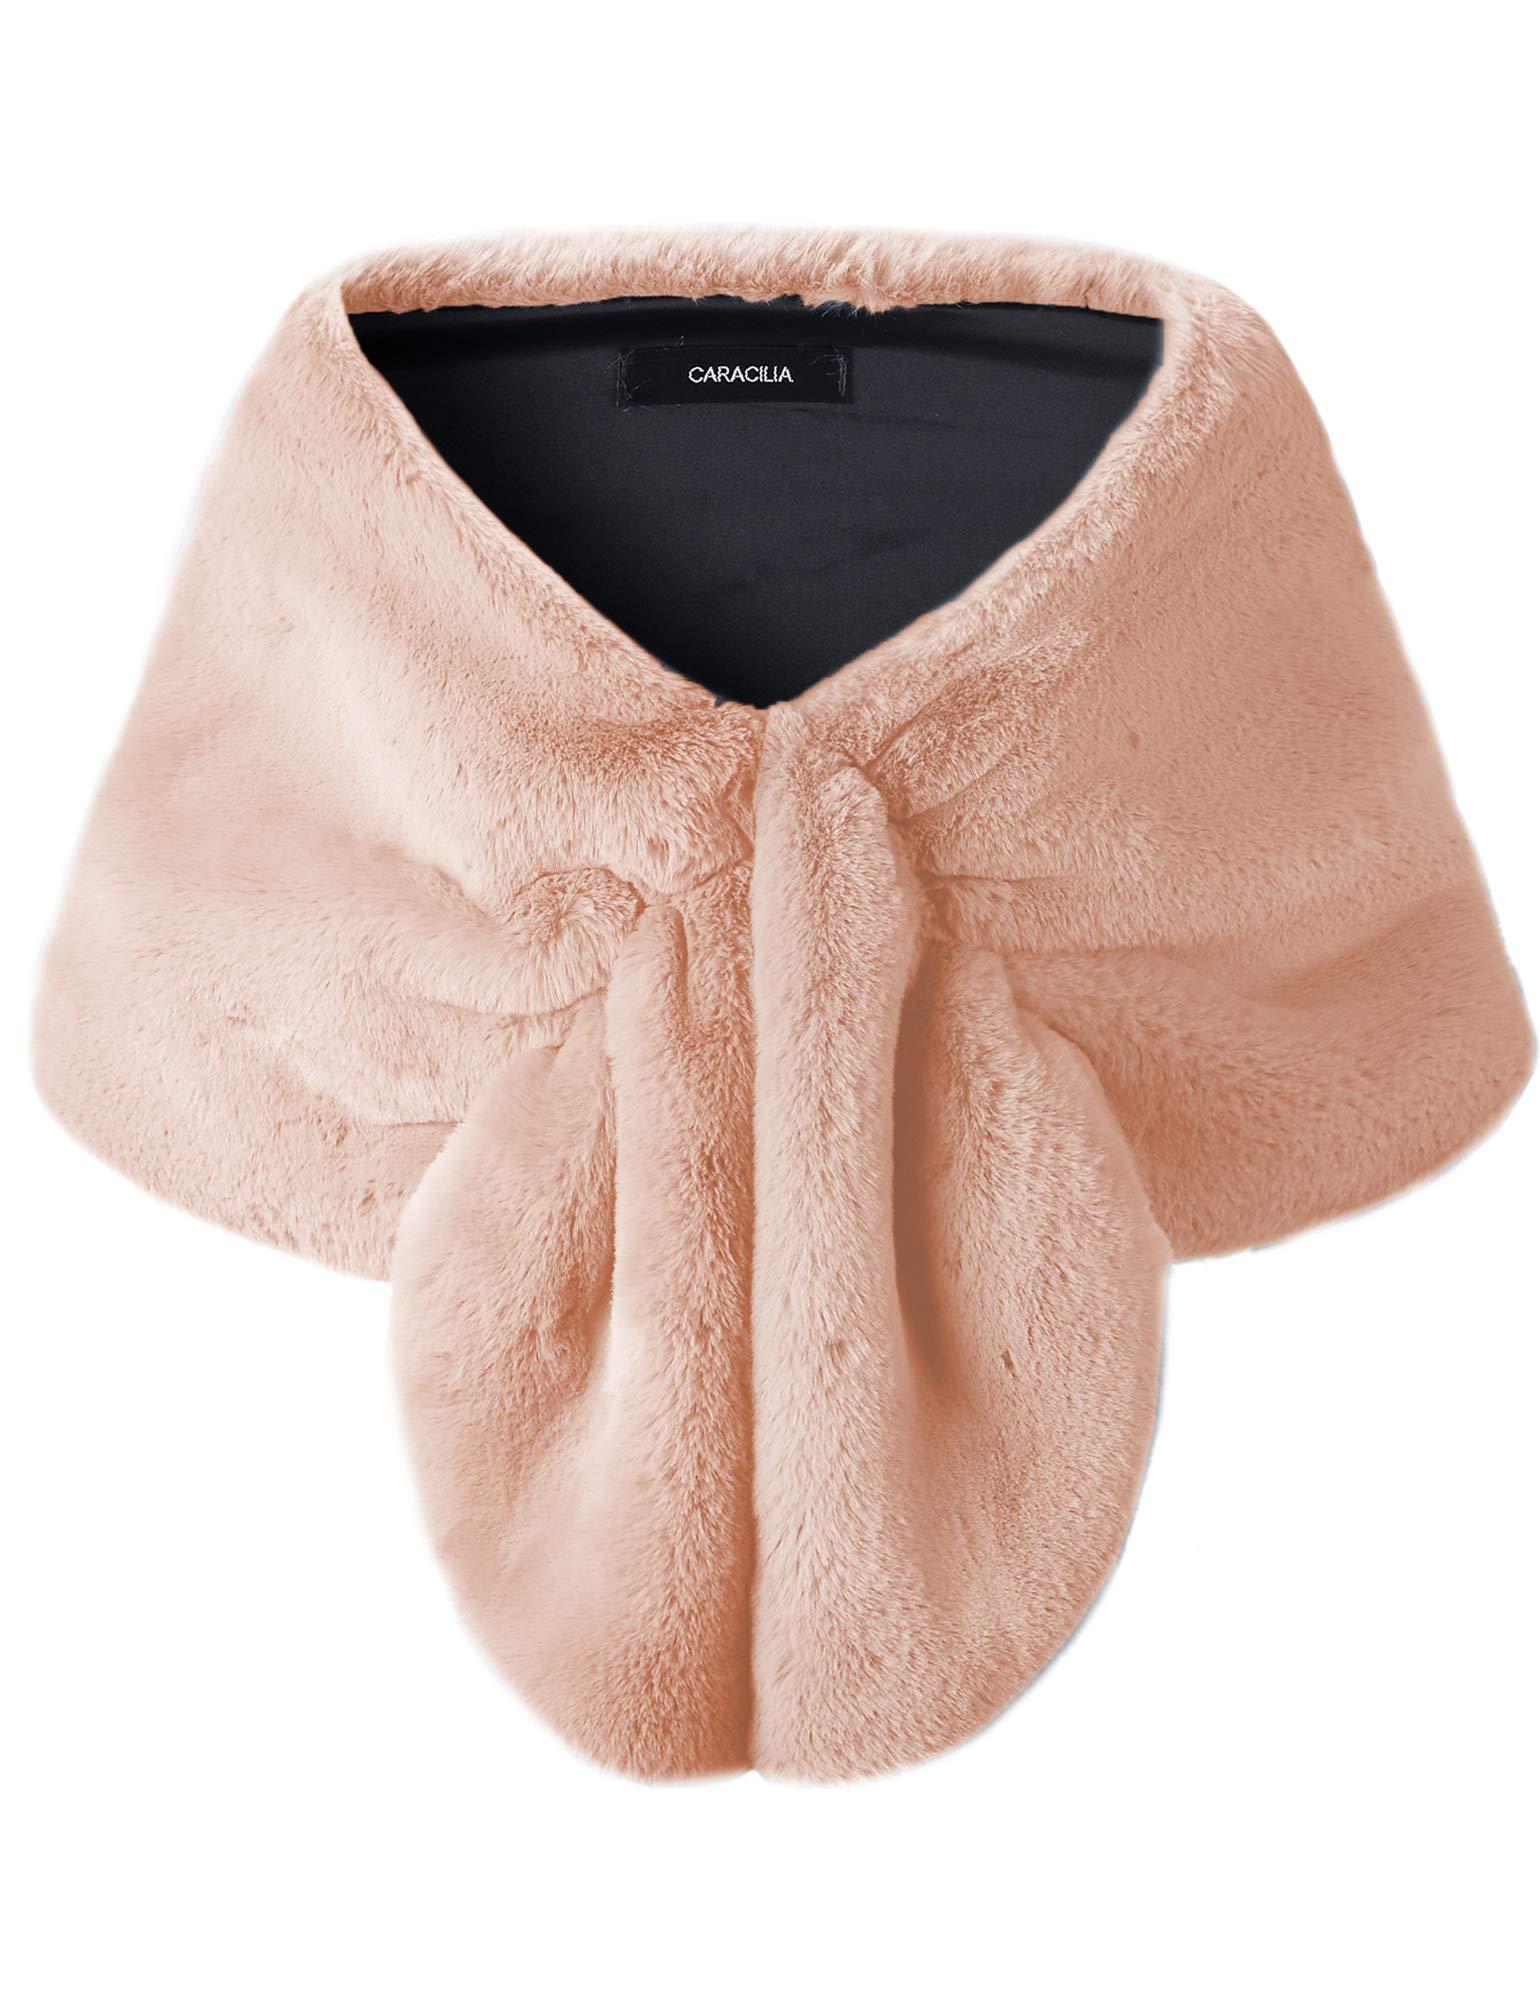 Caracilia Bridal Fur Stole, Wedding Fur Wraps & Shawls for Women and Girls oufen L CAFB4